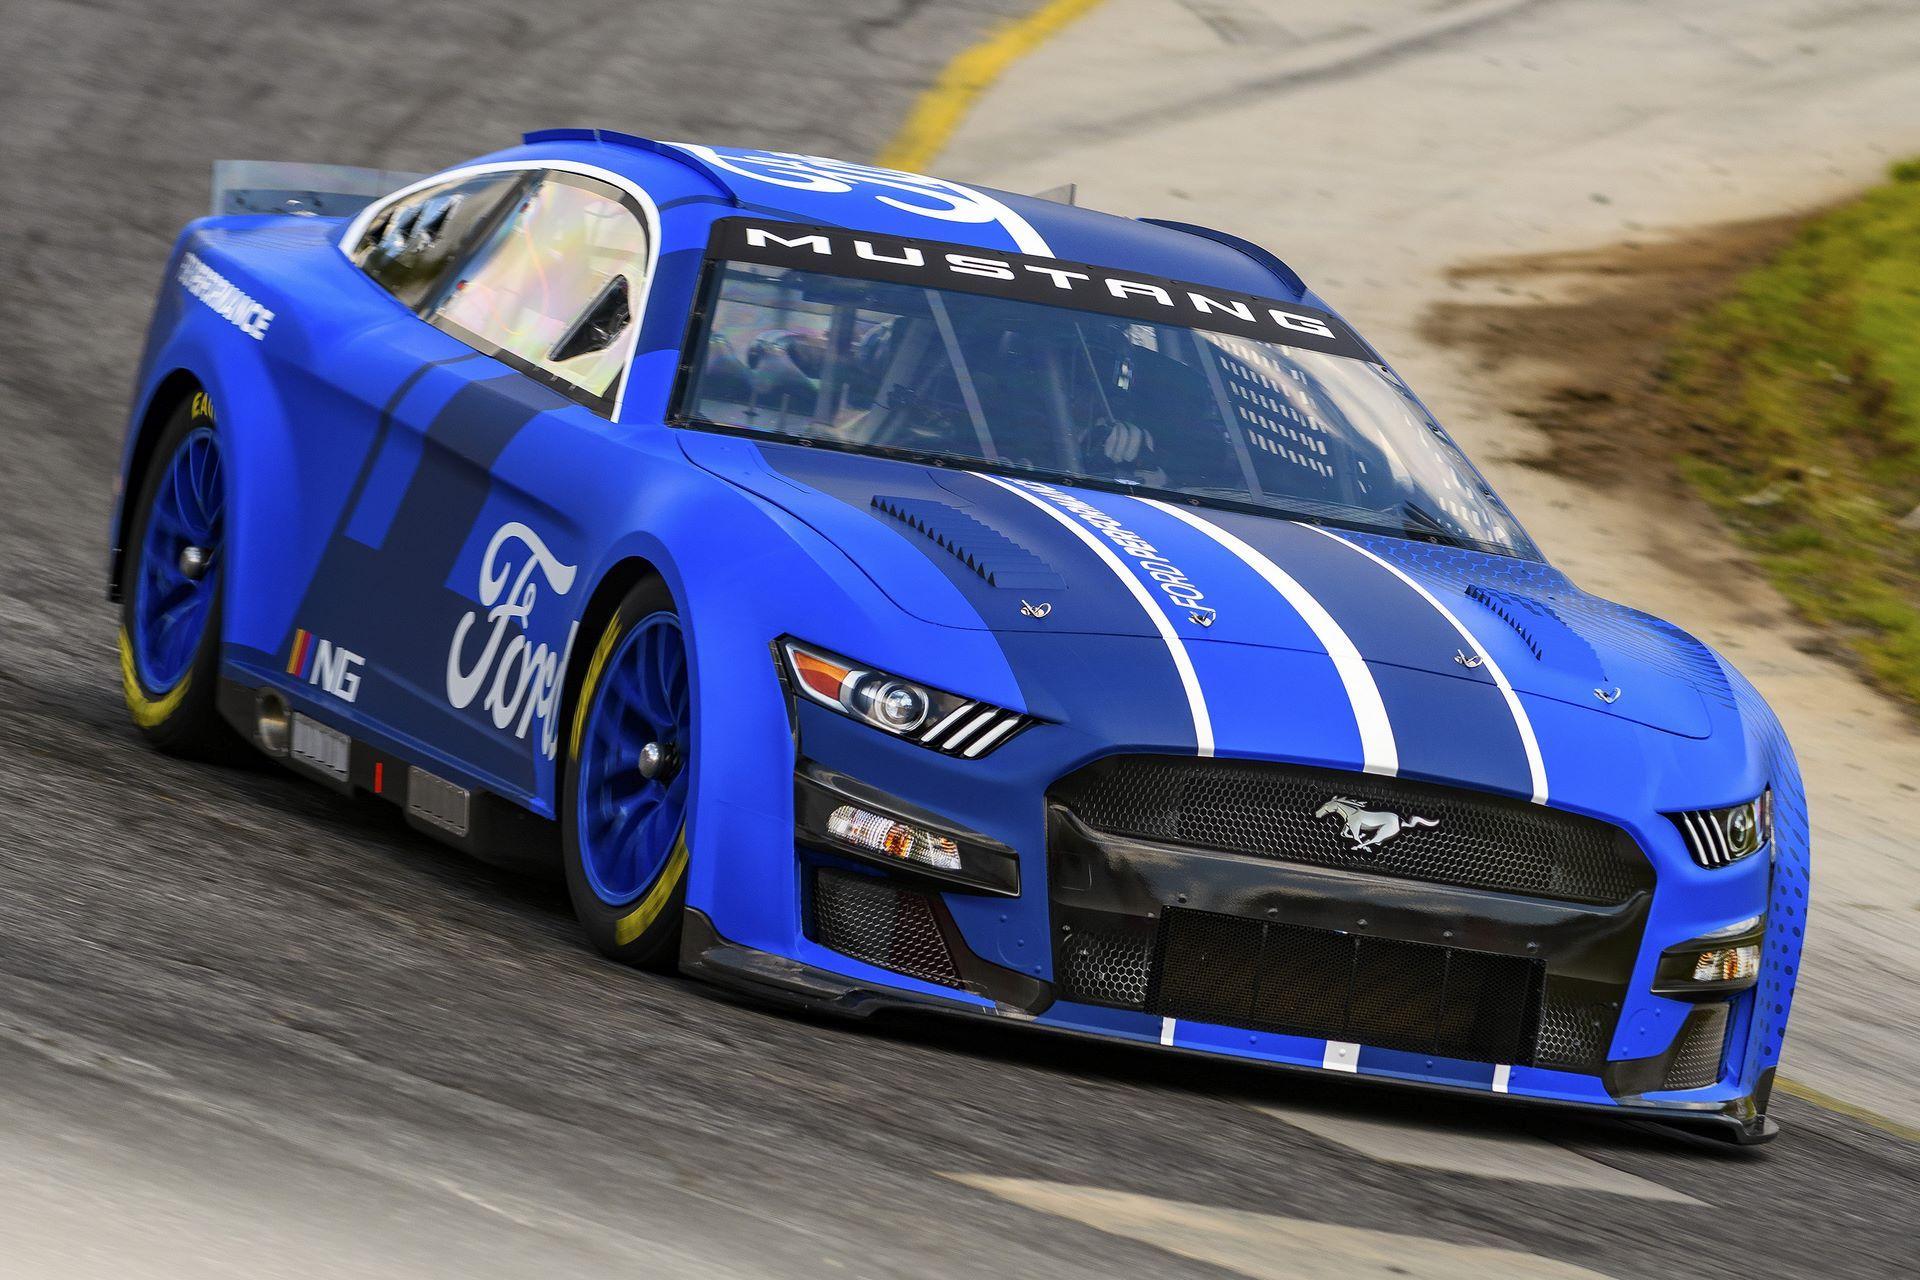 Ford-Mustang-Next-Gen-Nascar-16